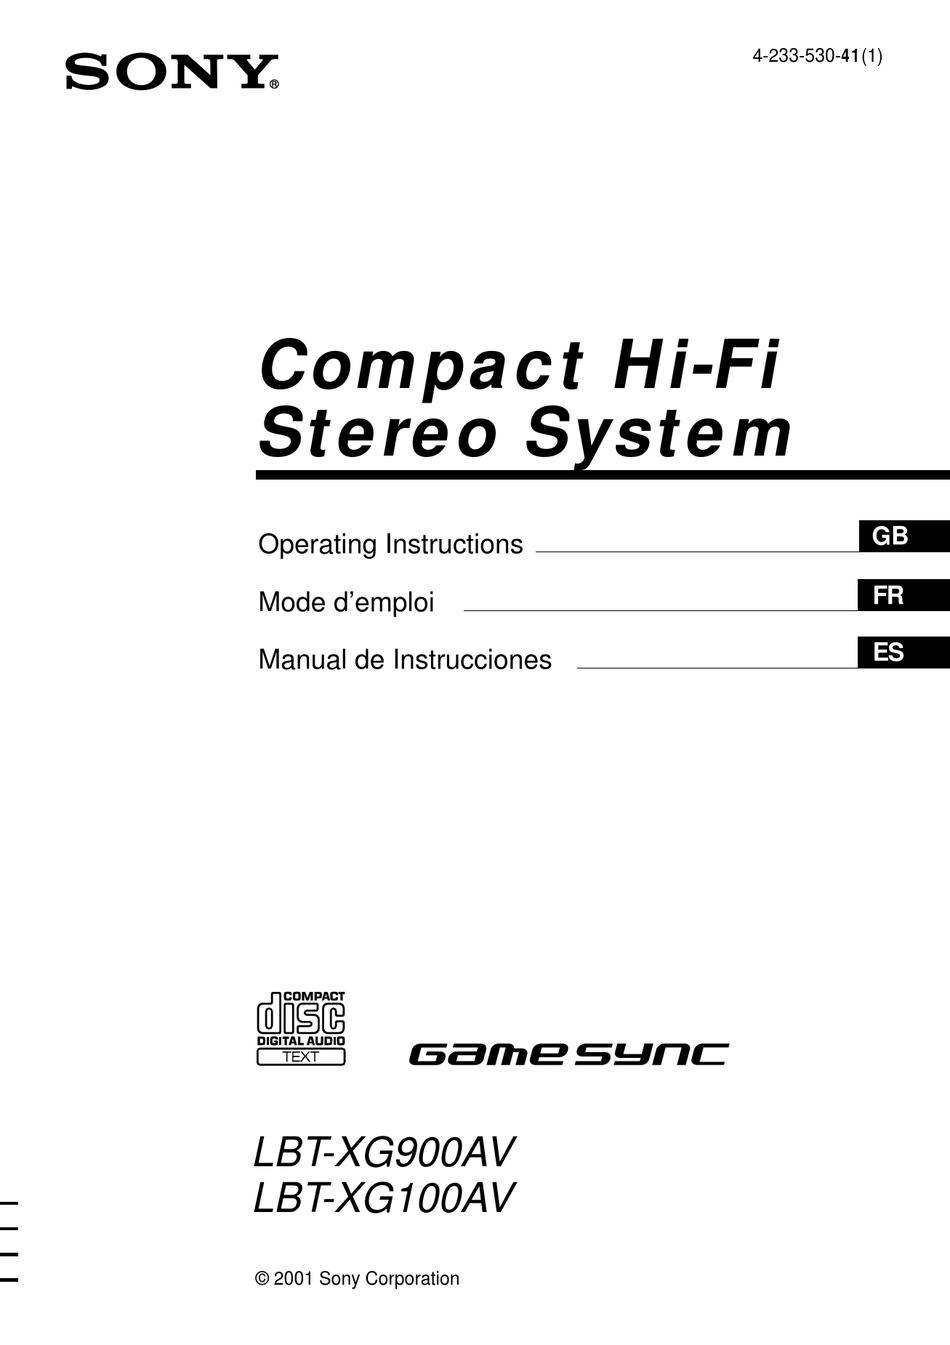 SONY GAME SYNC LBT-XG900AV OPERATING INSTRUCTIONS MANUAL